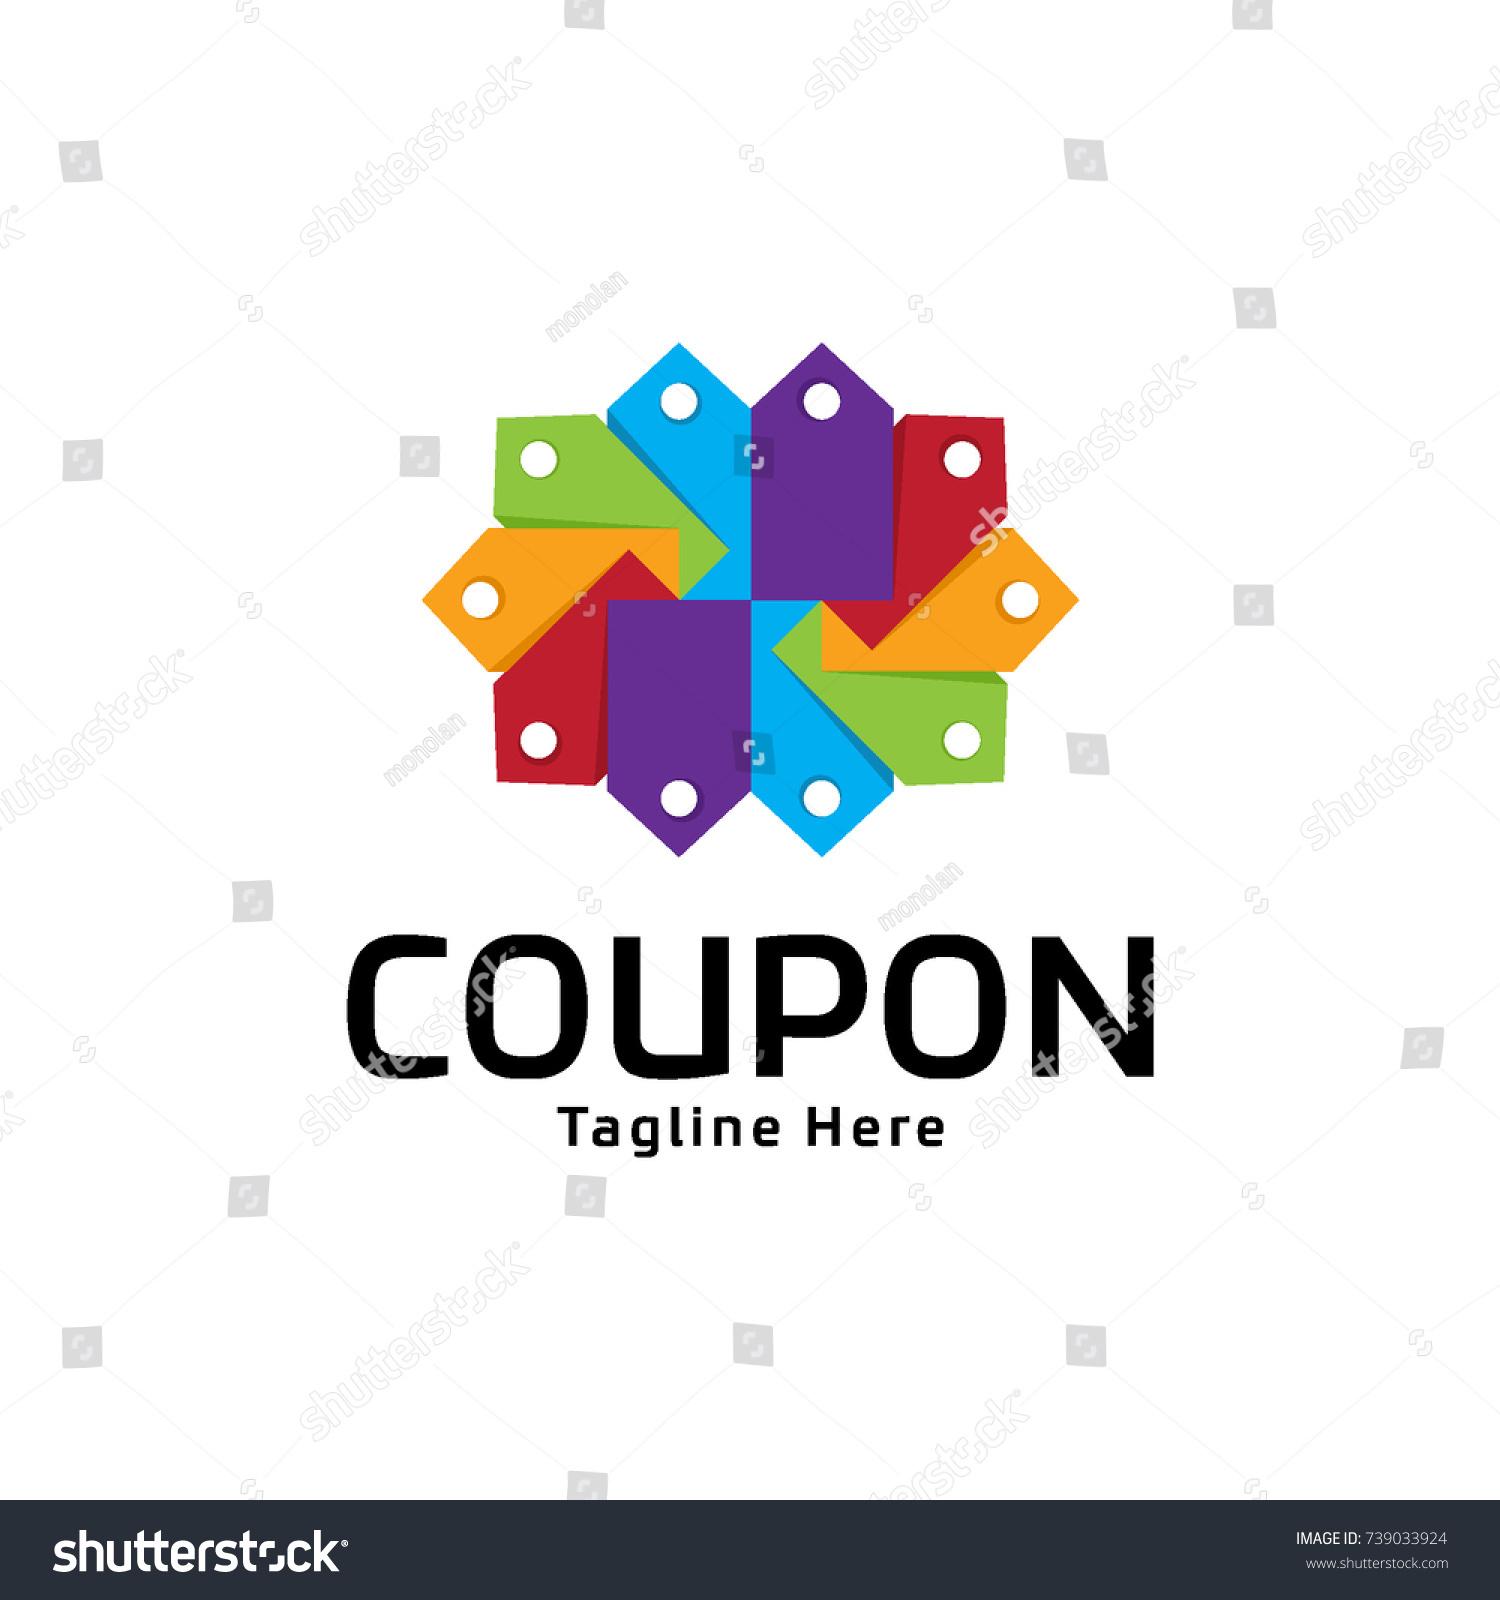 Abstract Coupon Logo Design Stock Vector Royalty Free 739033924